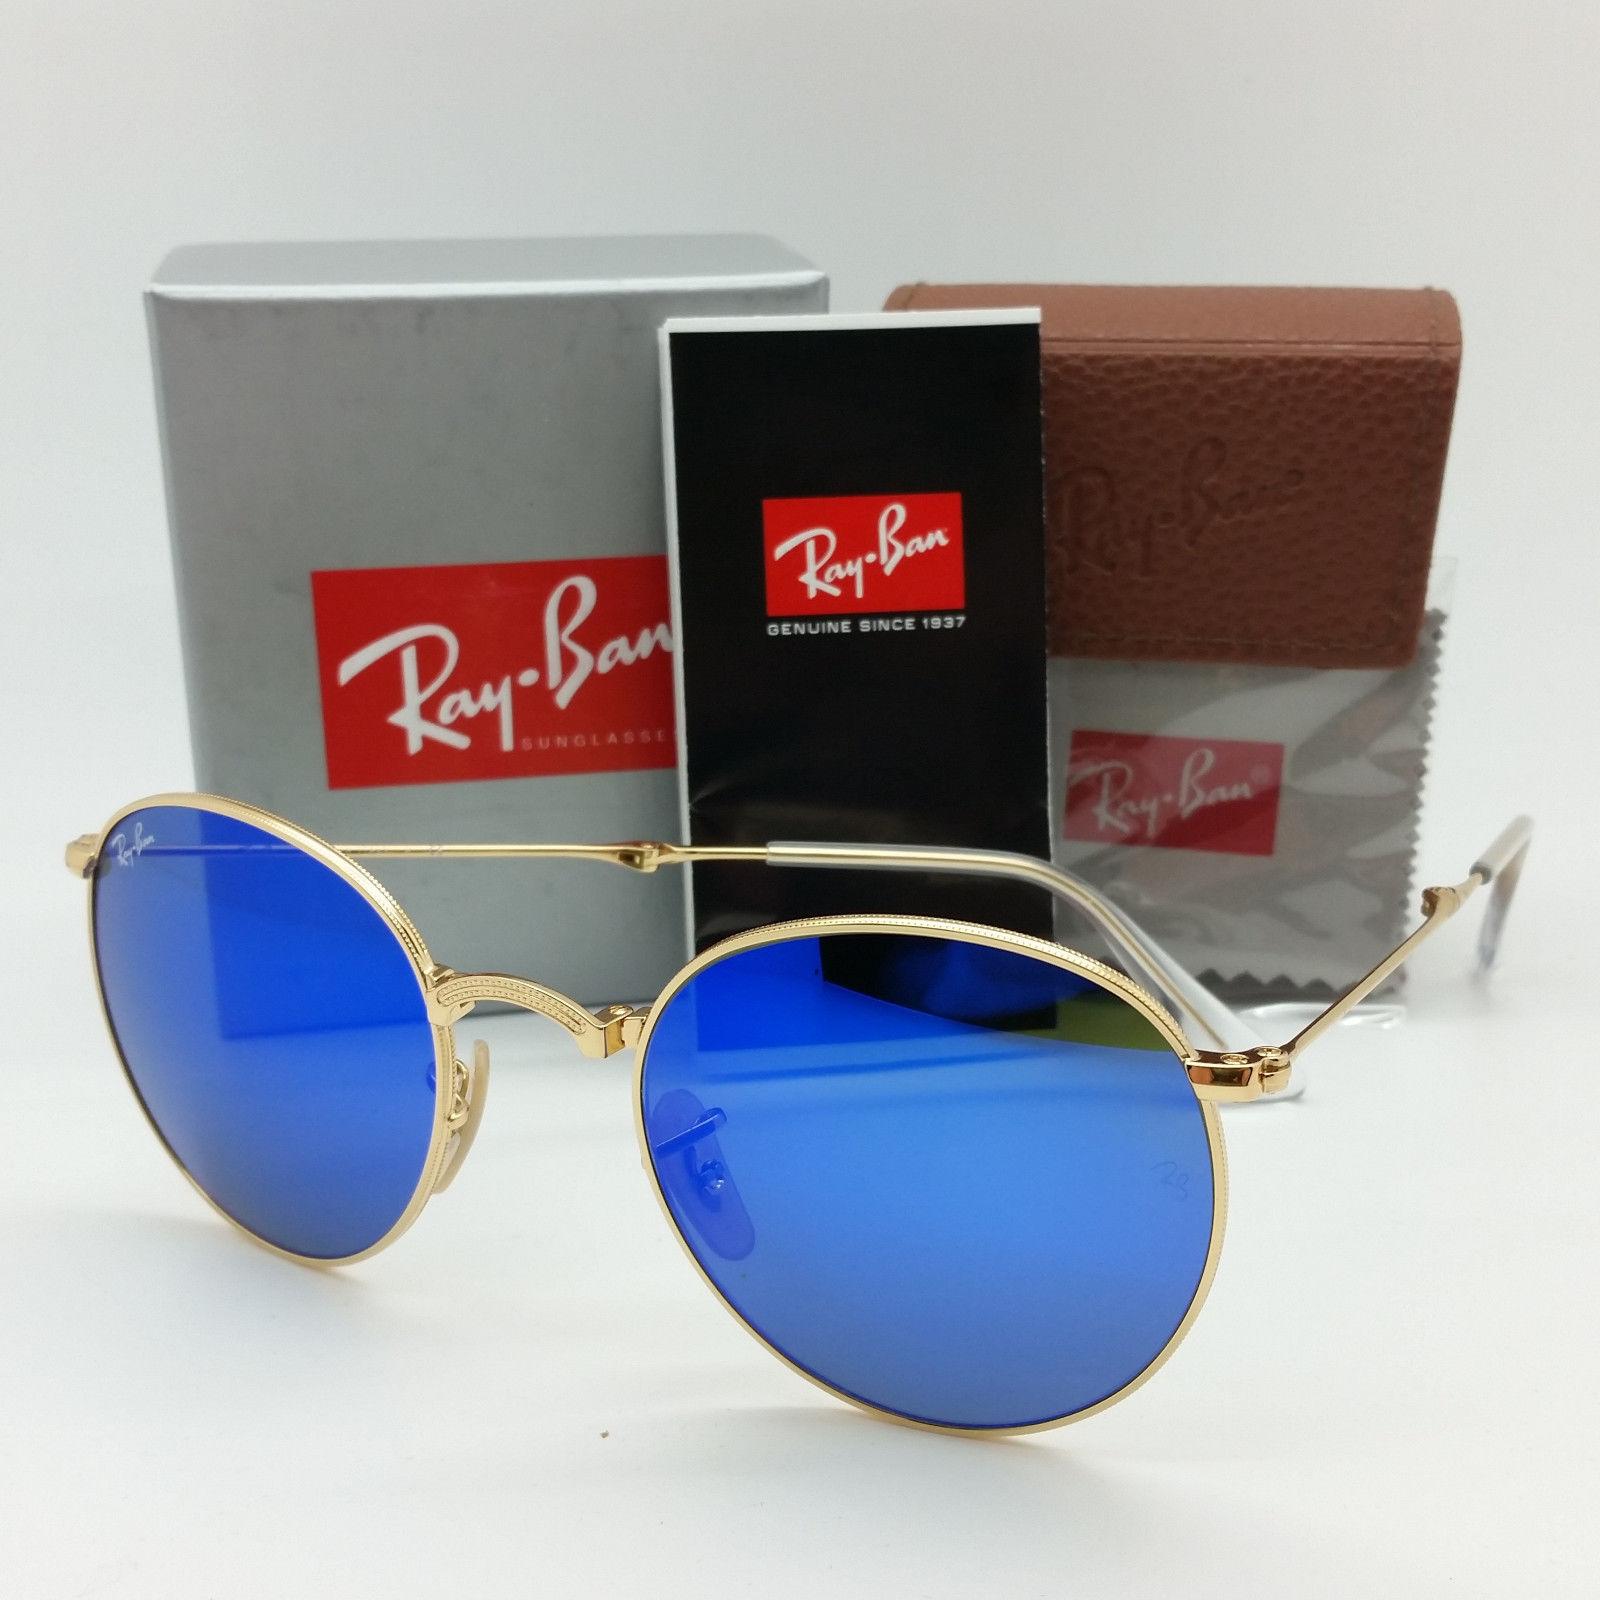 Ray-Ban RB3532 001/68 Folding Round Metal Gold Blue Mirror